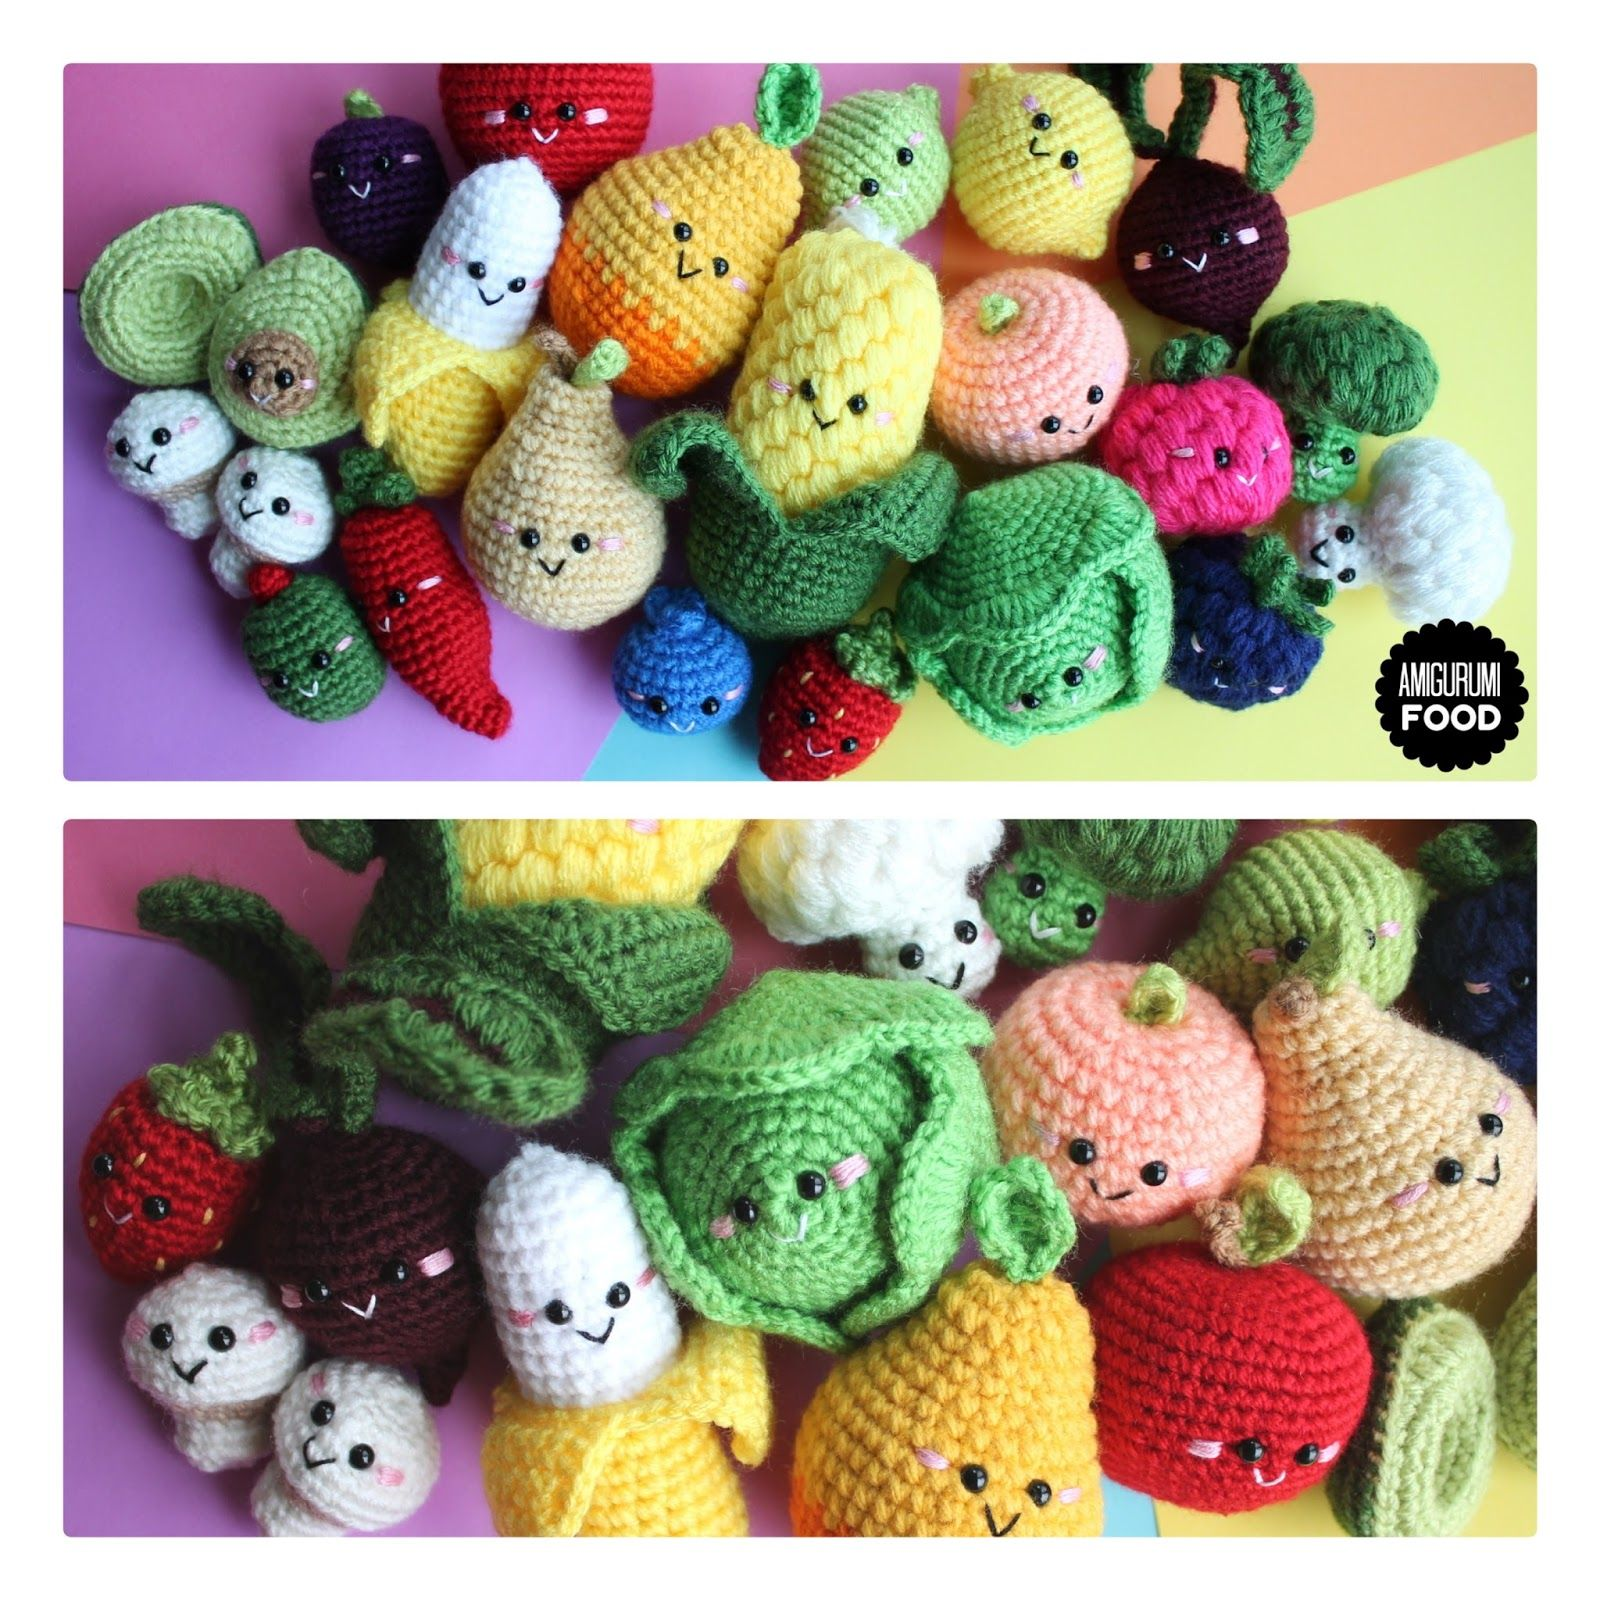 Amigurumi Food Crochet Free Pattern Fruits And Vegetables Crochet